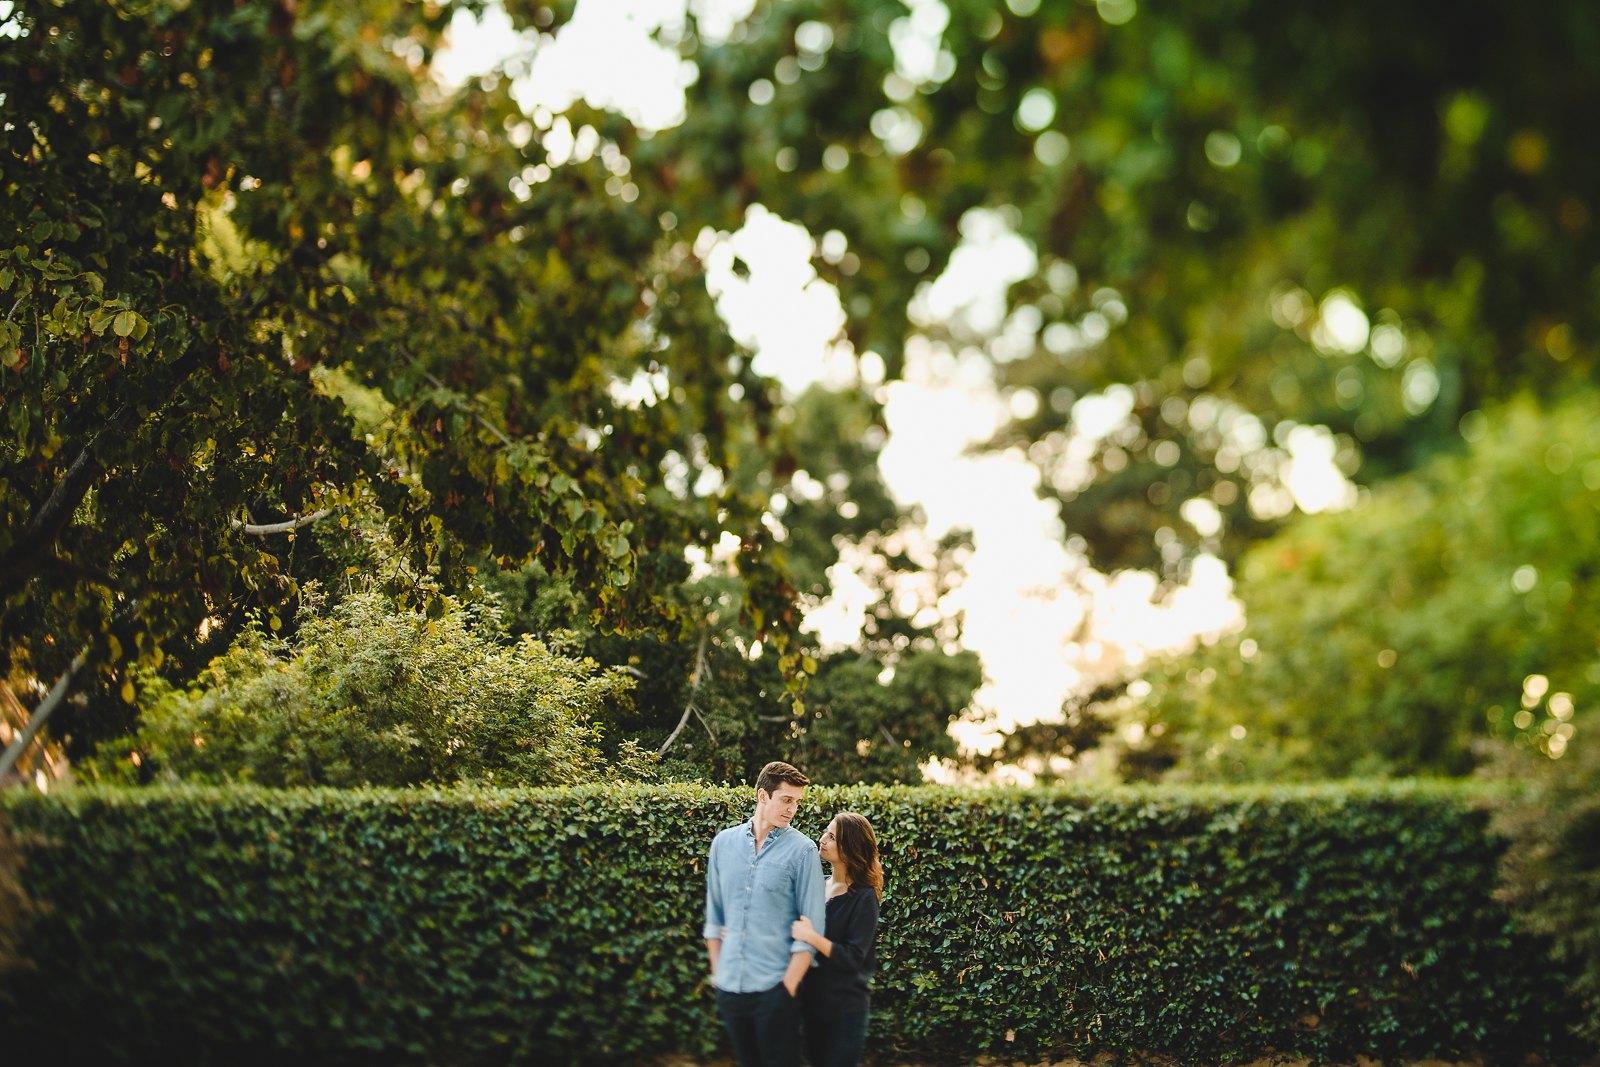 balboa-park-engagement-photos-13.jpg